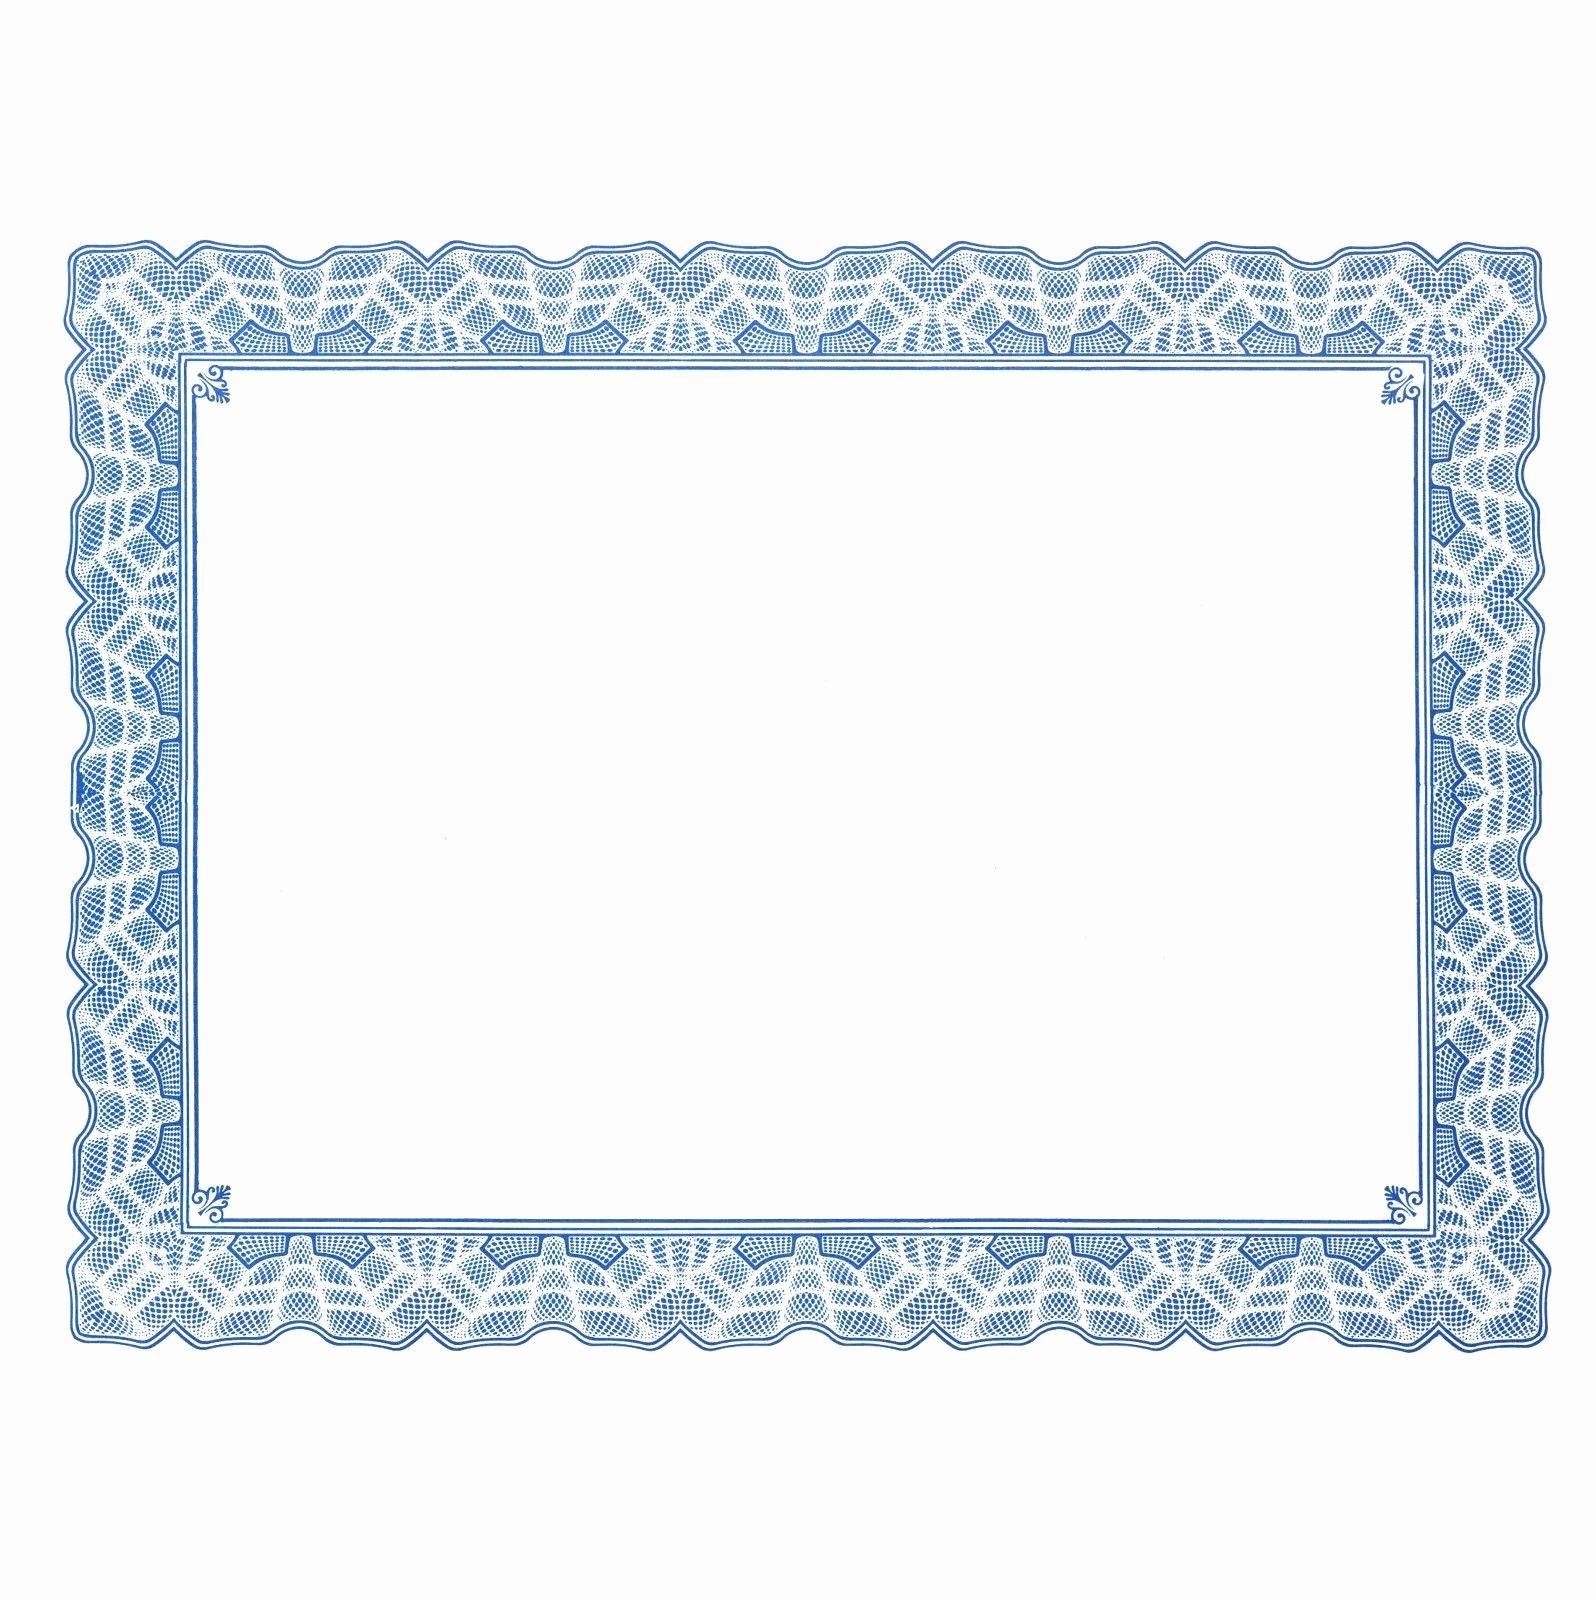 Certificate Border Design Free Download Elegant Free Certificate Border Templates for Word